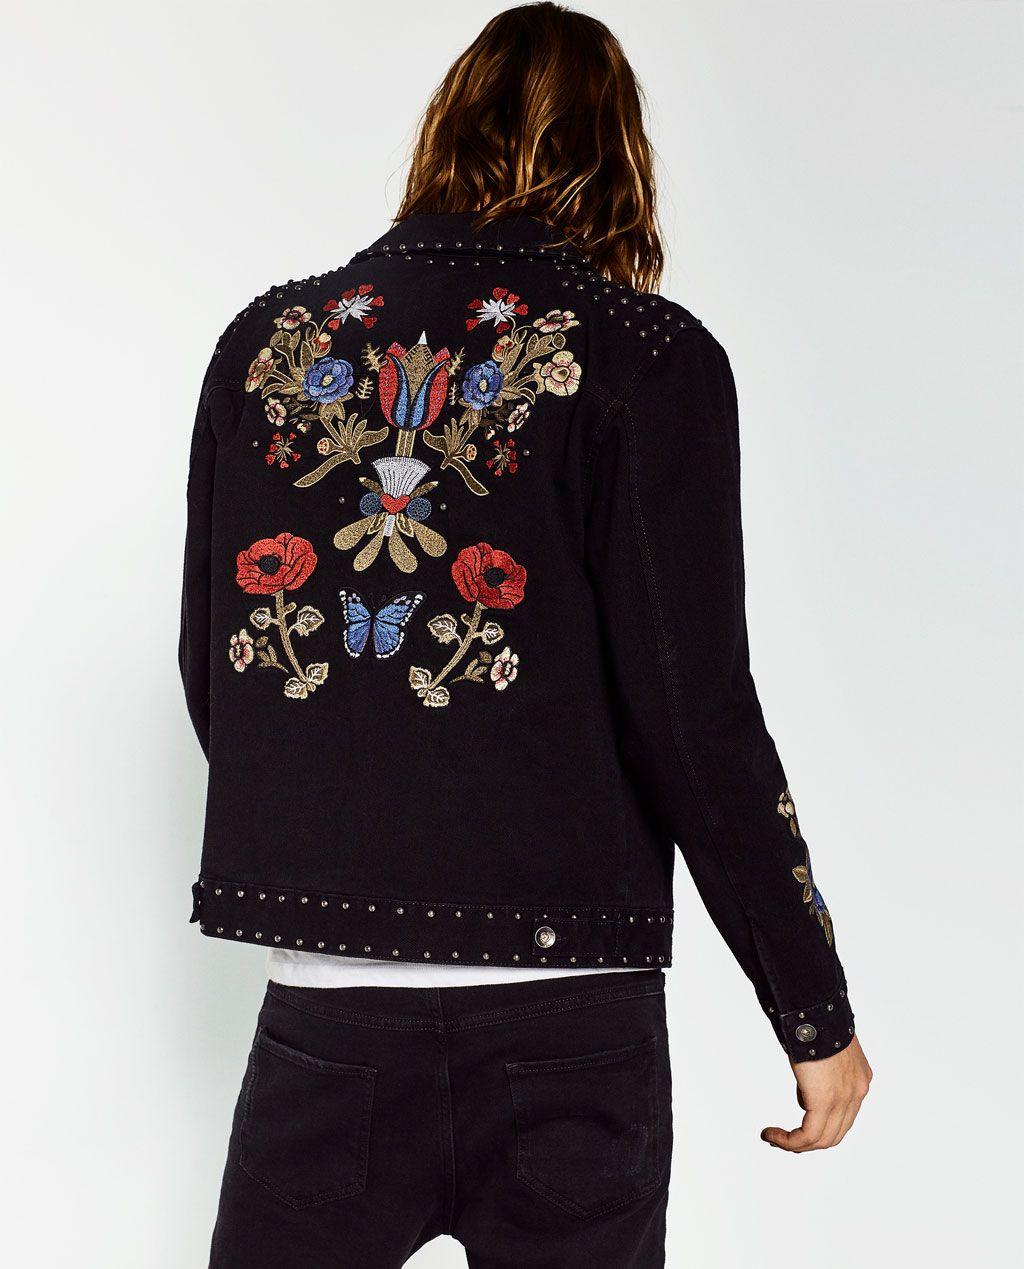 New Denim Jacket Men 2017 Fashion American Embroidery Design Mens Slim Fit Jean  Jacket Casual Stylish